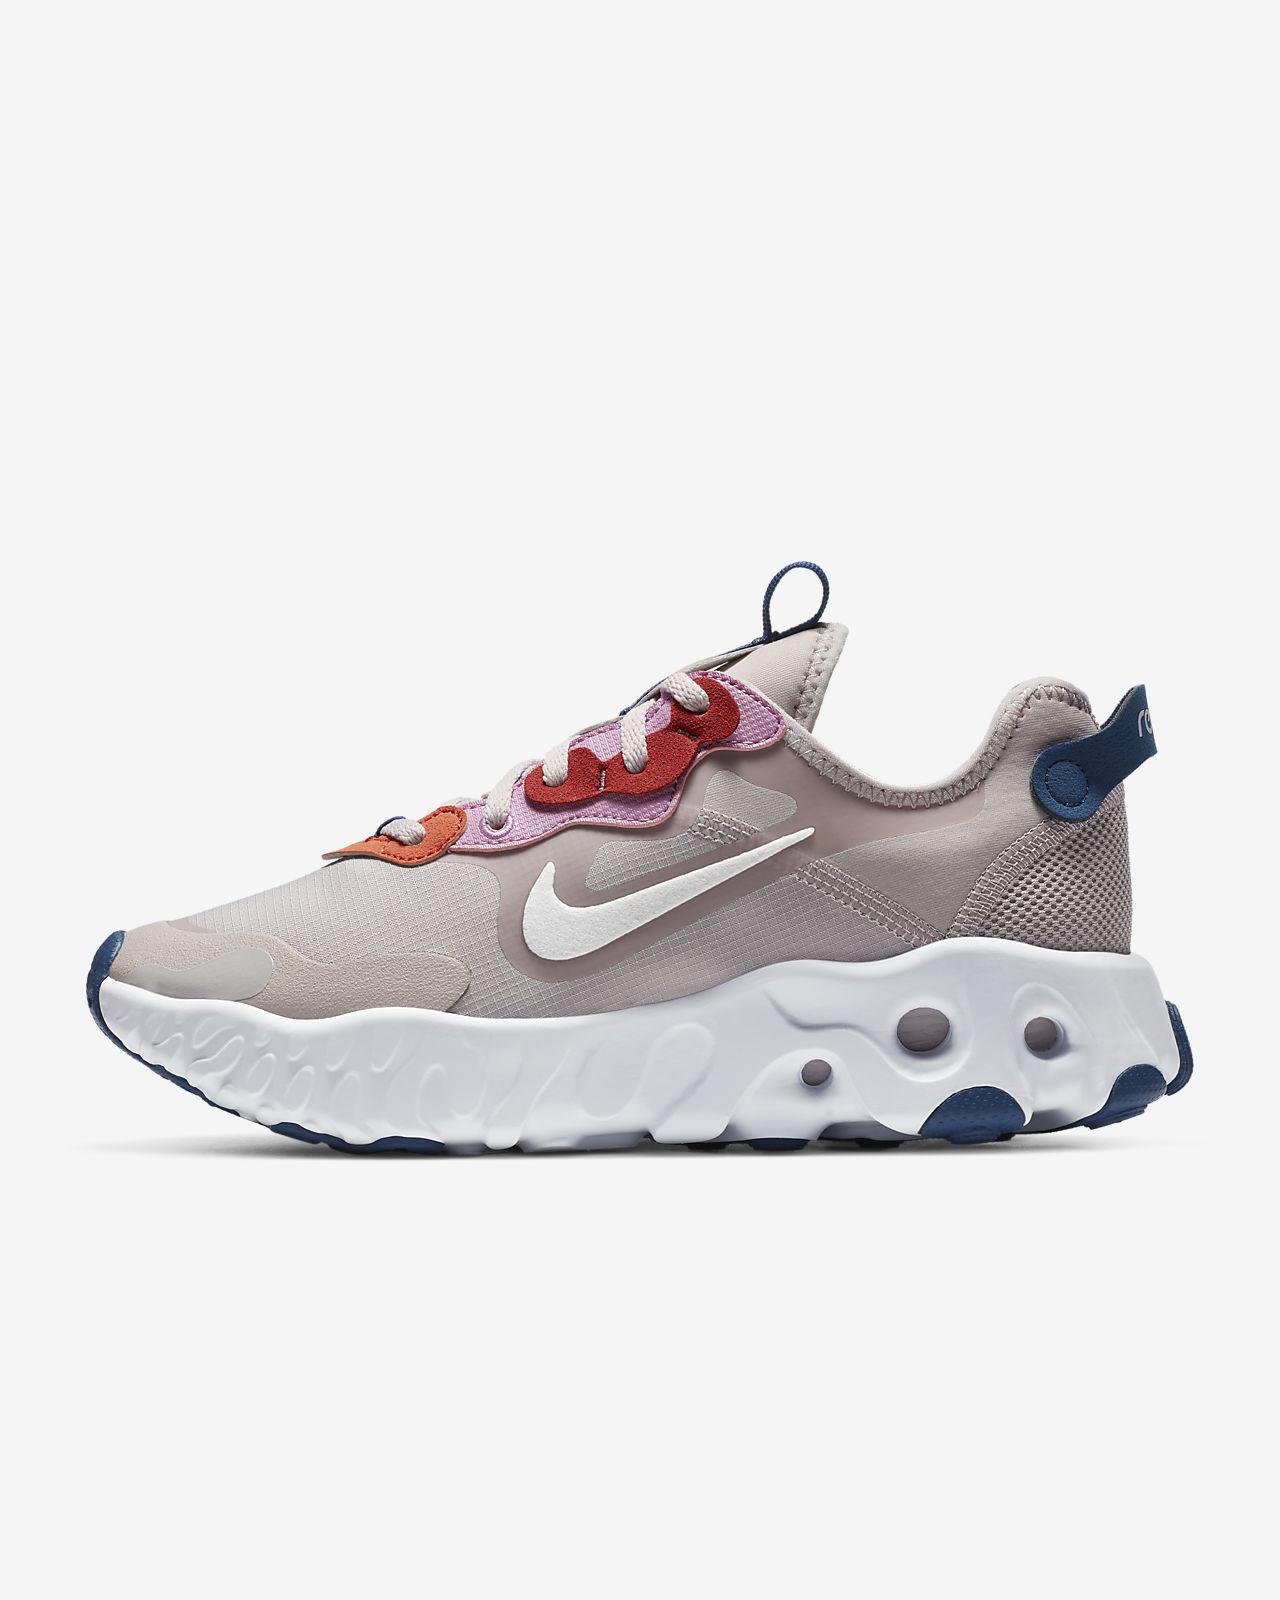 Chaussure Nike React Art3mis pour Femme